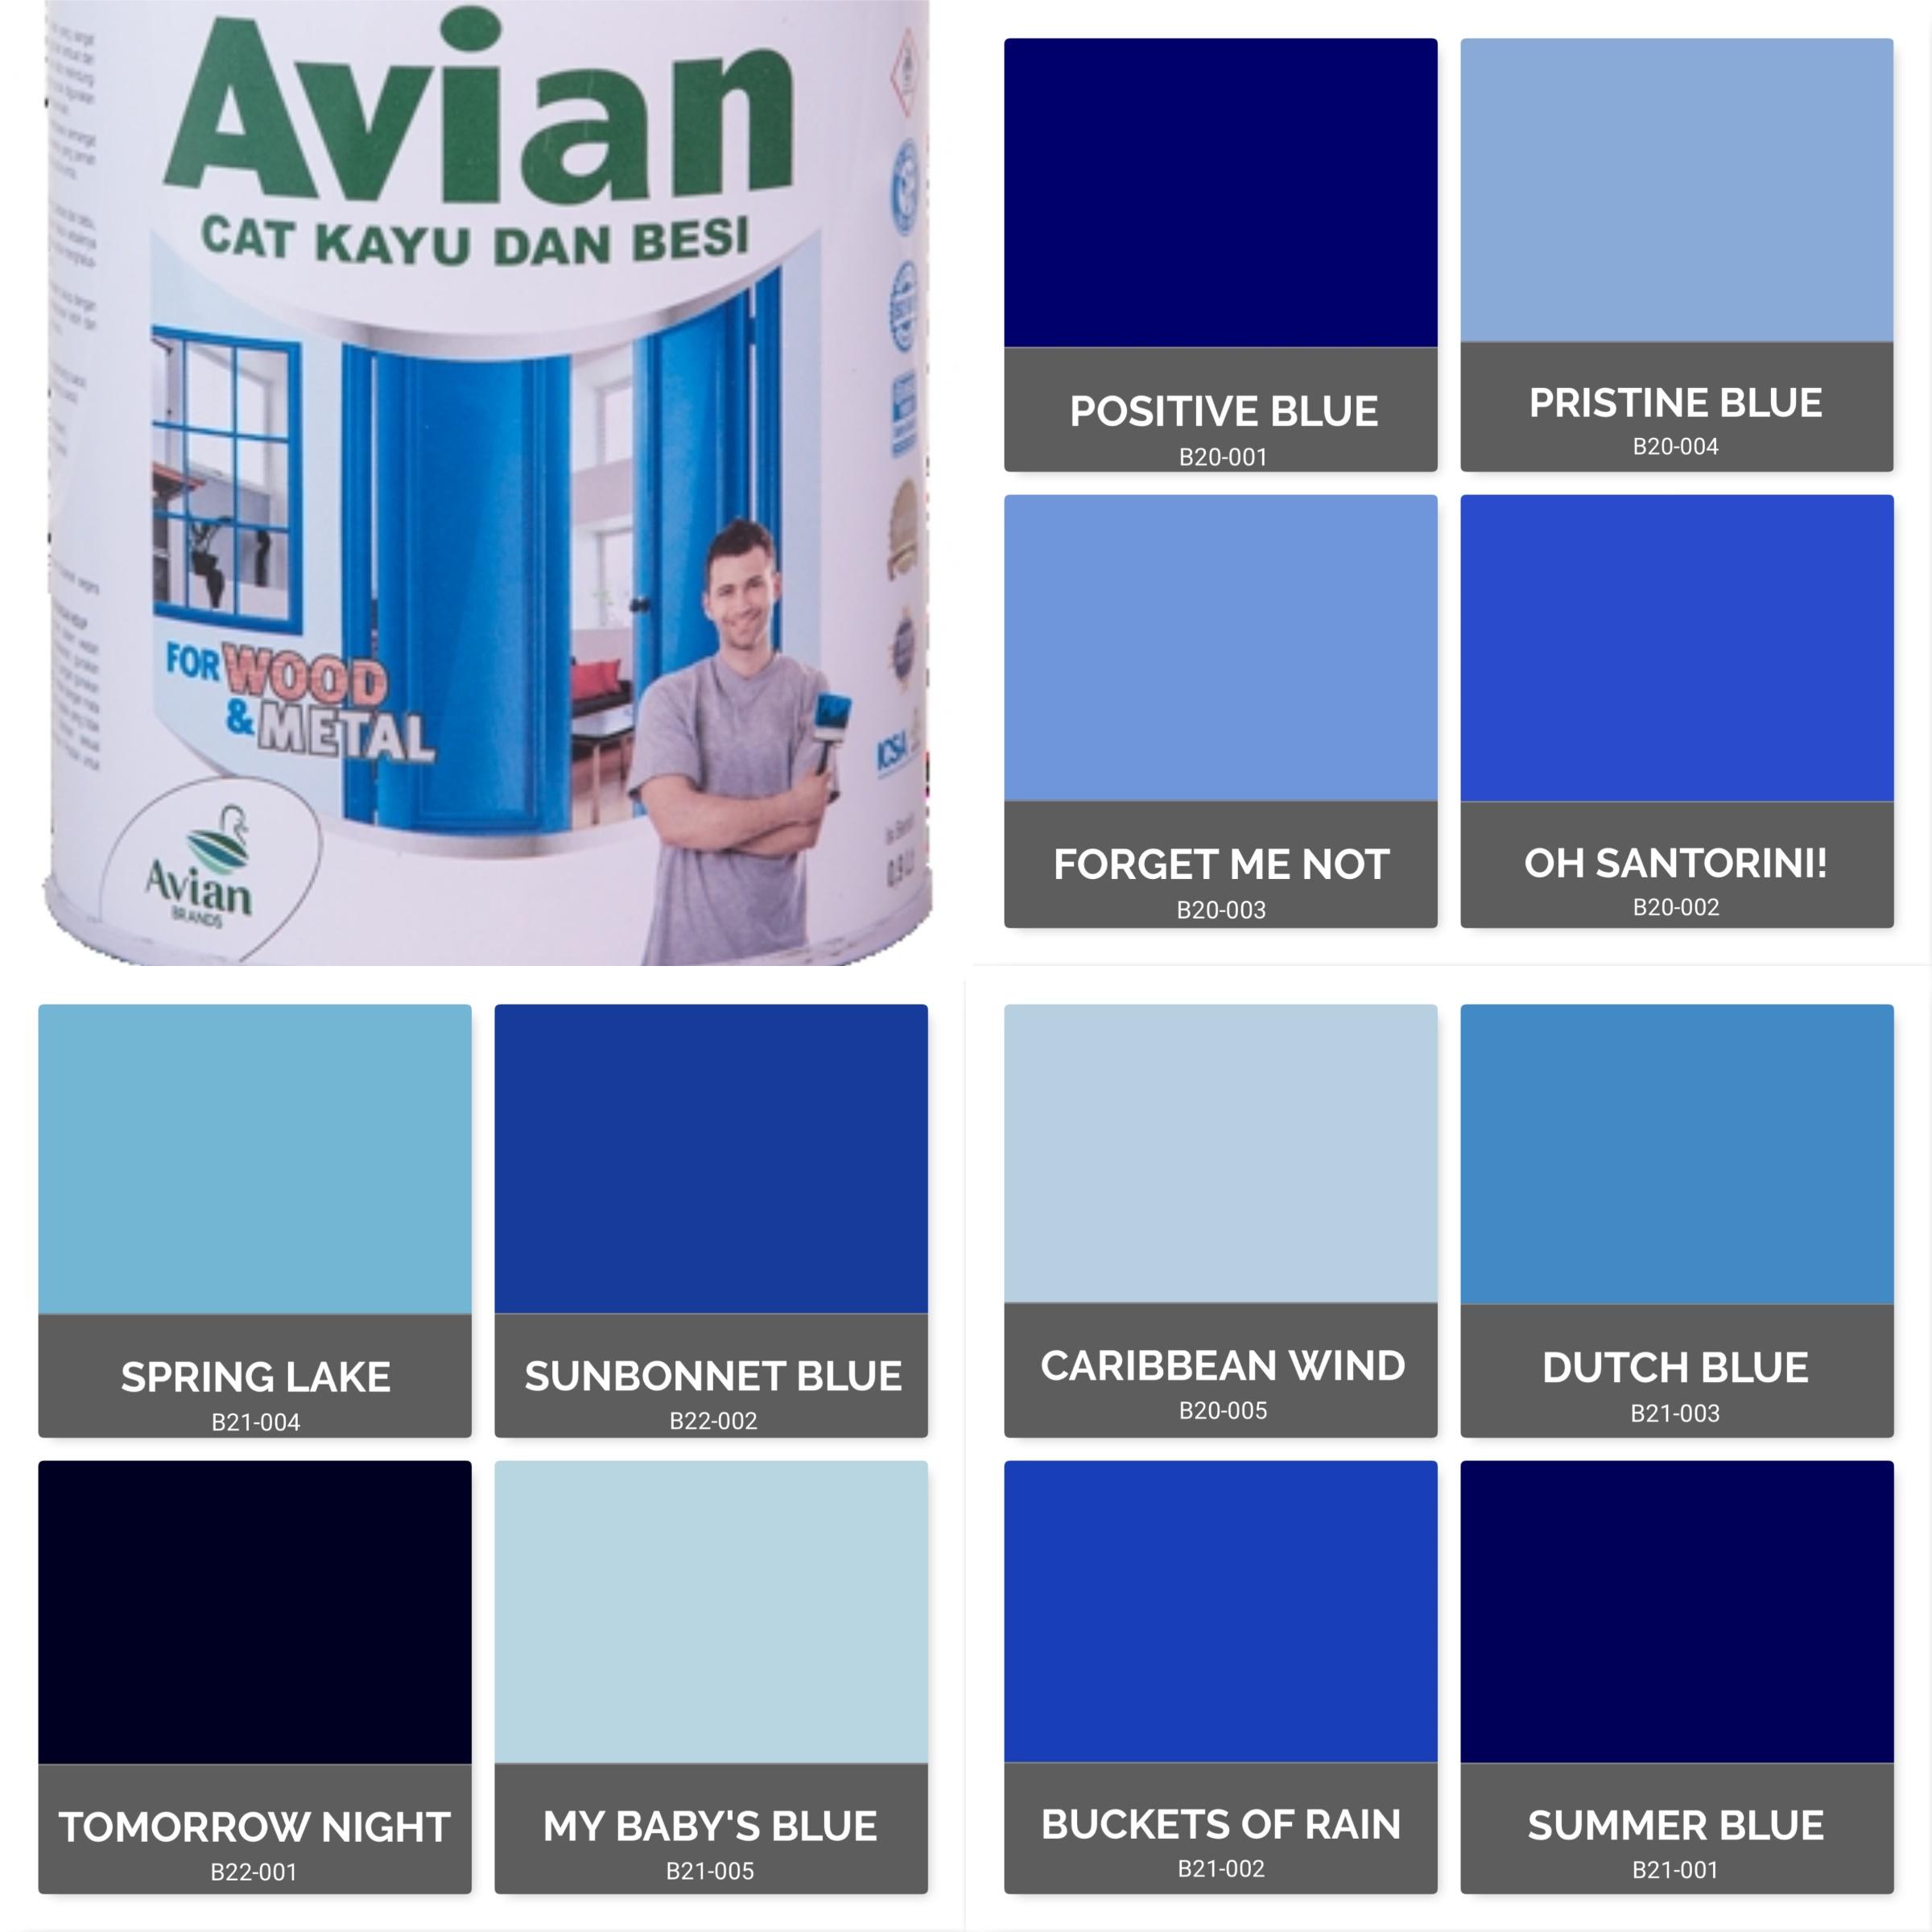 Avian Kayu Dan Besi Avian Cat Tinting Warna Blue Kode B Lazada Indonesia Cat warna biru muda